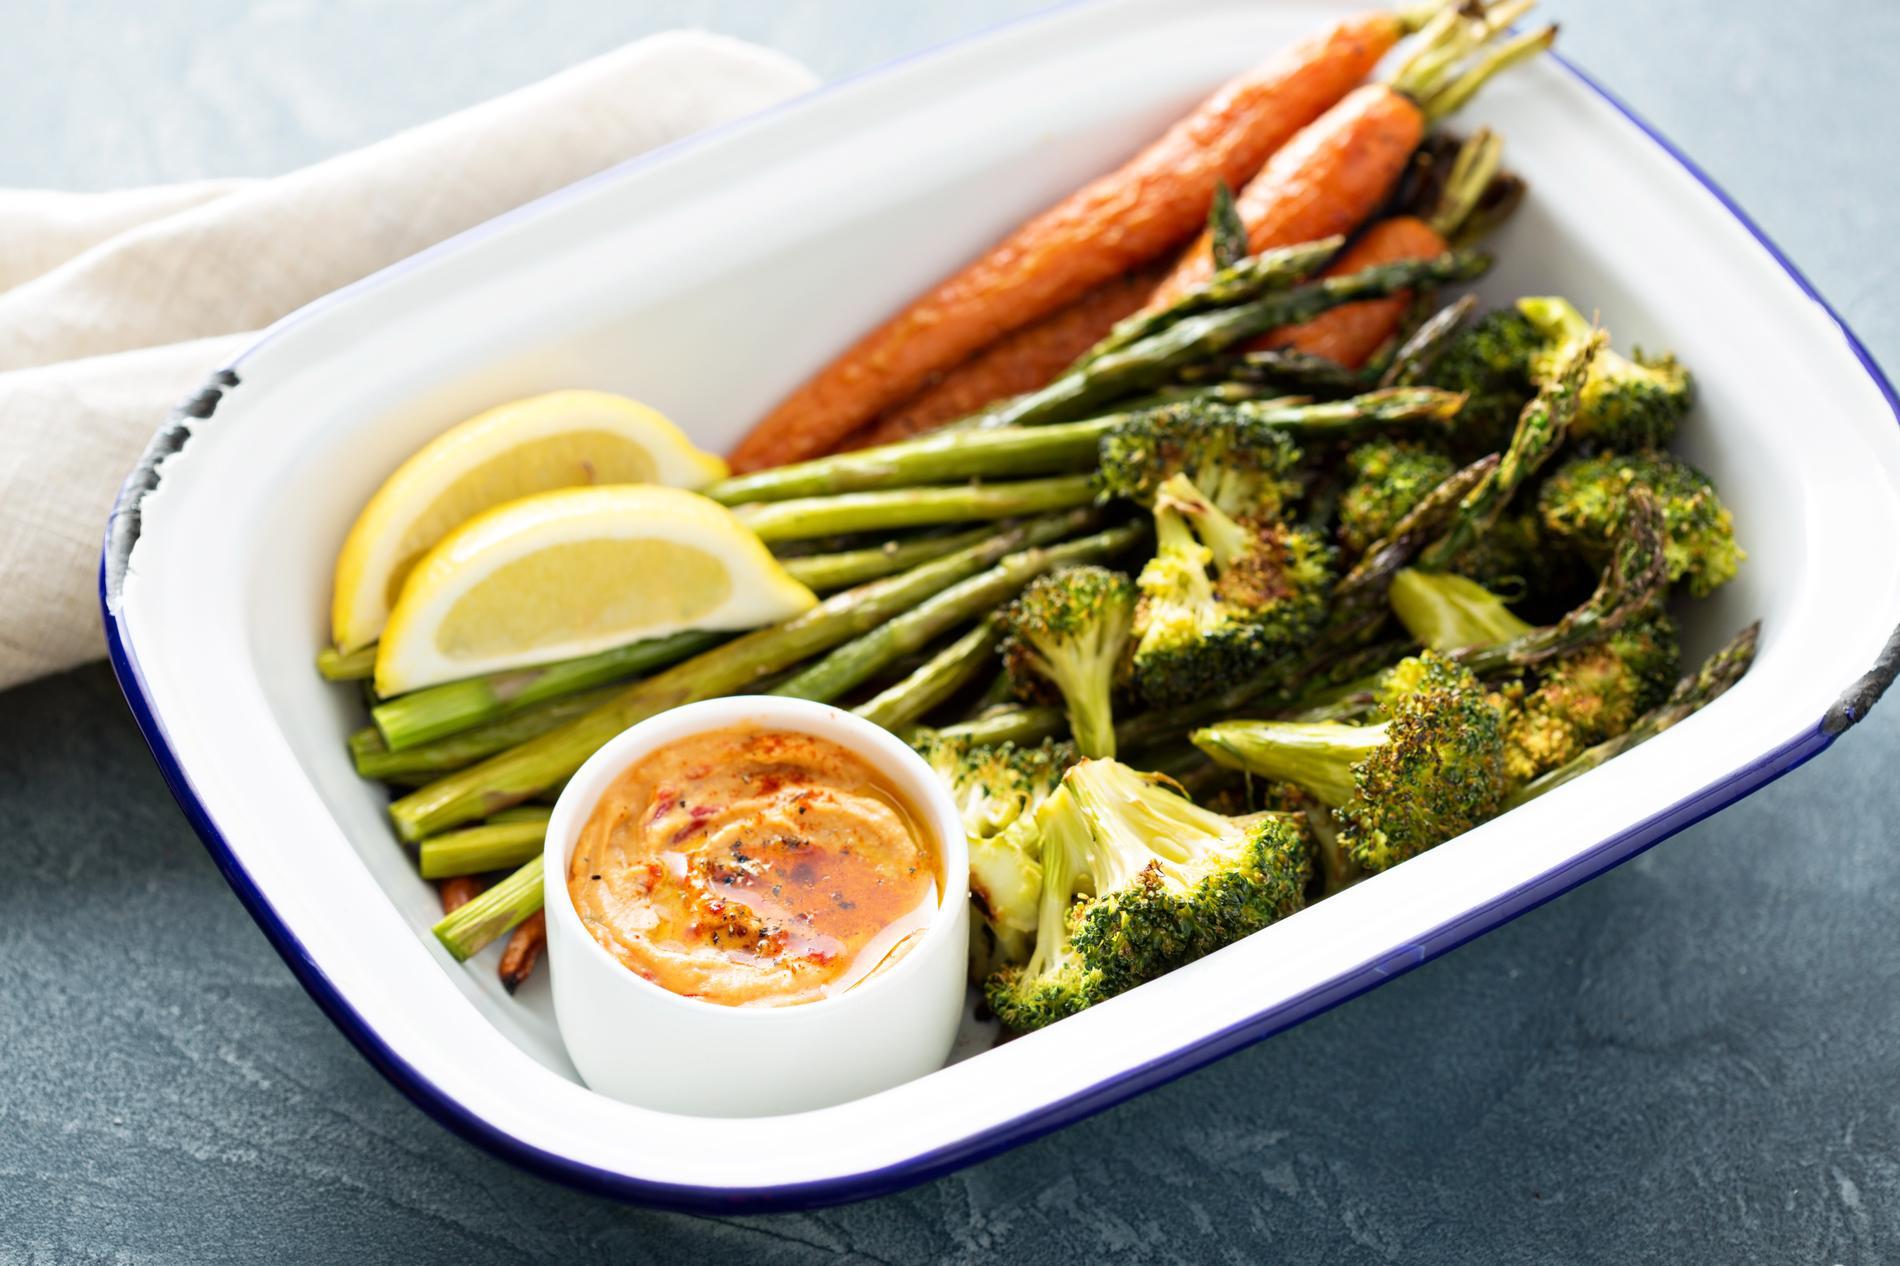 entree a base de legumes